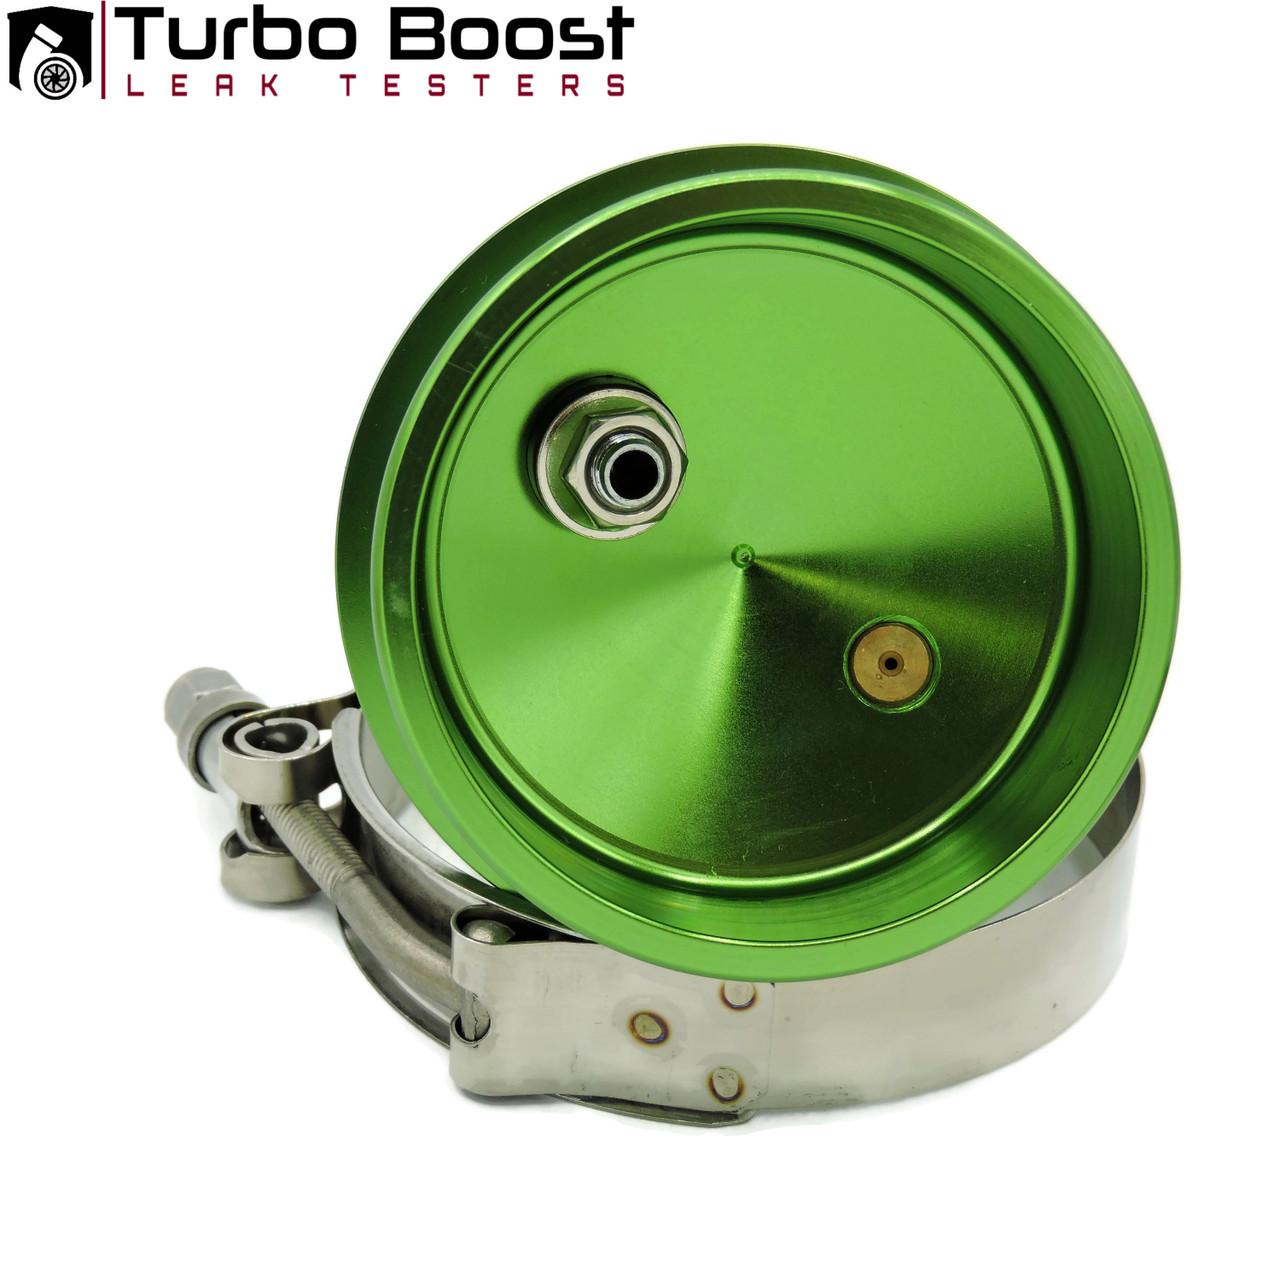 "3"" Turbo Boost Leak Testers - END CAP - 6061 Billet Aluminum 30PSI T-BOLT -PREMIUM"